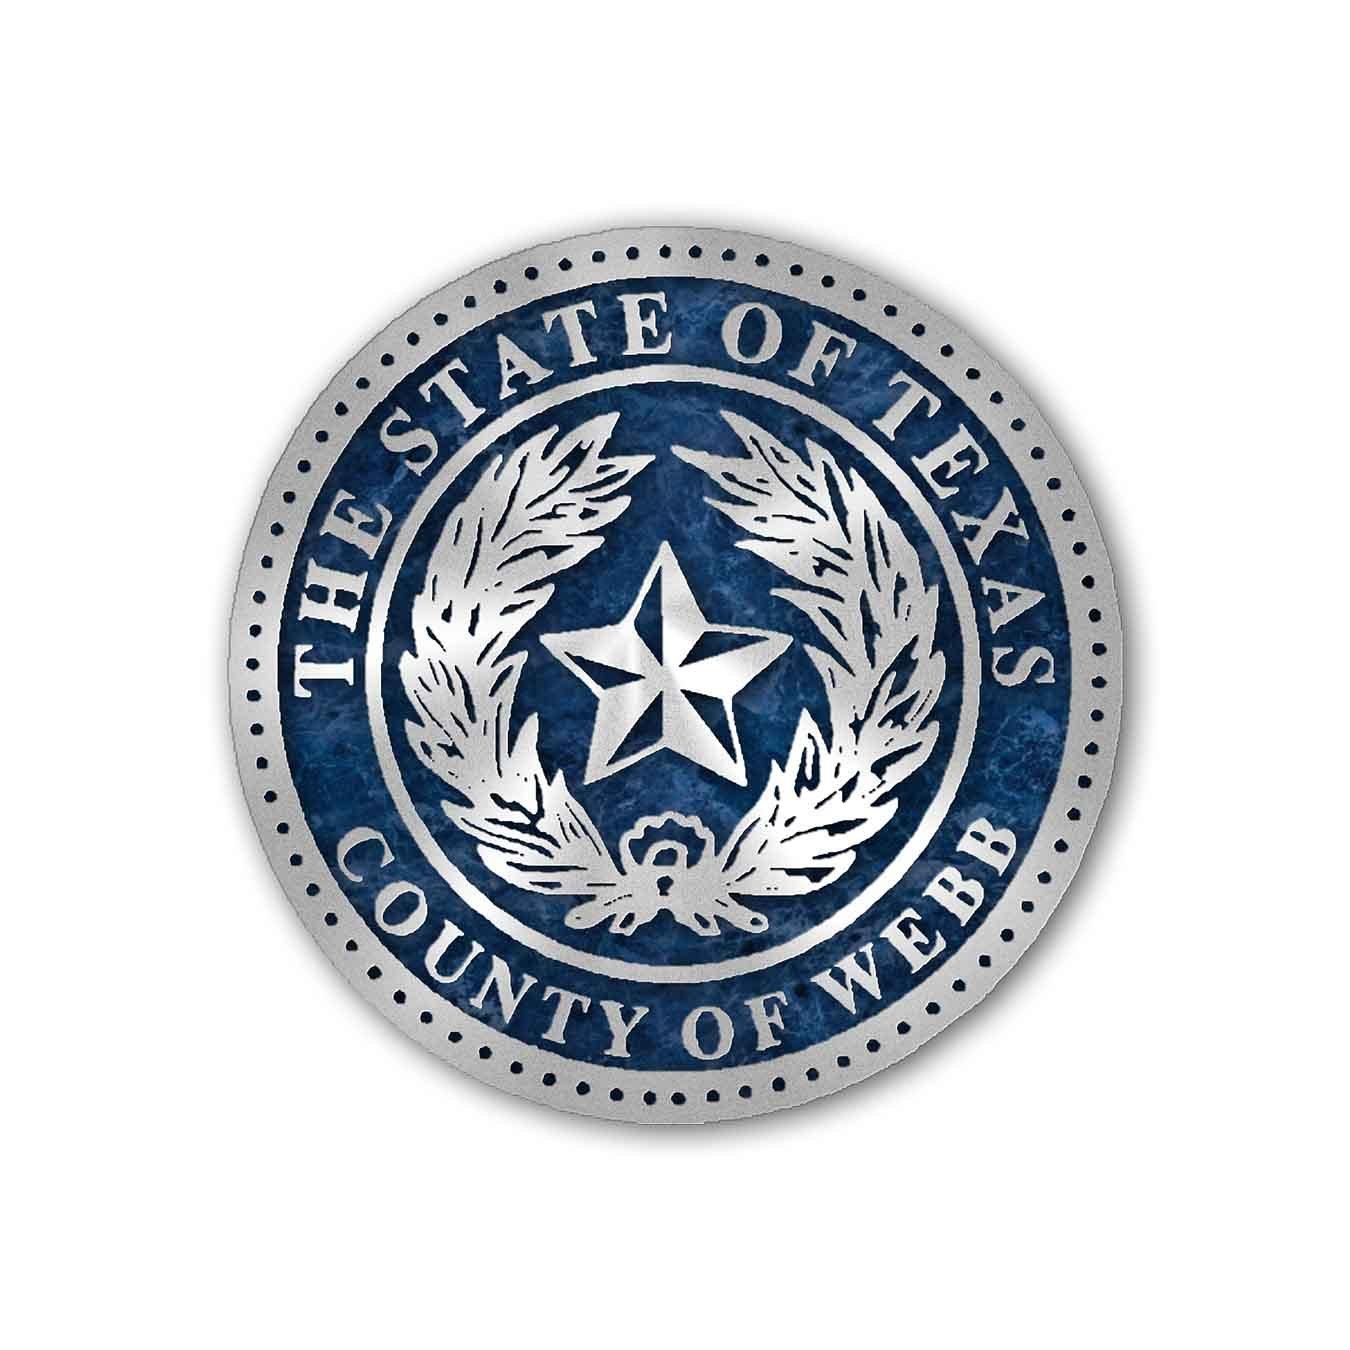 Webb County Texas